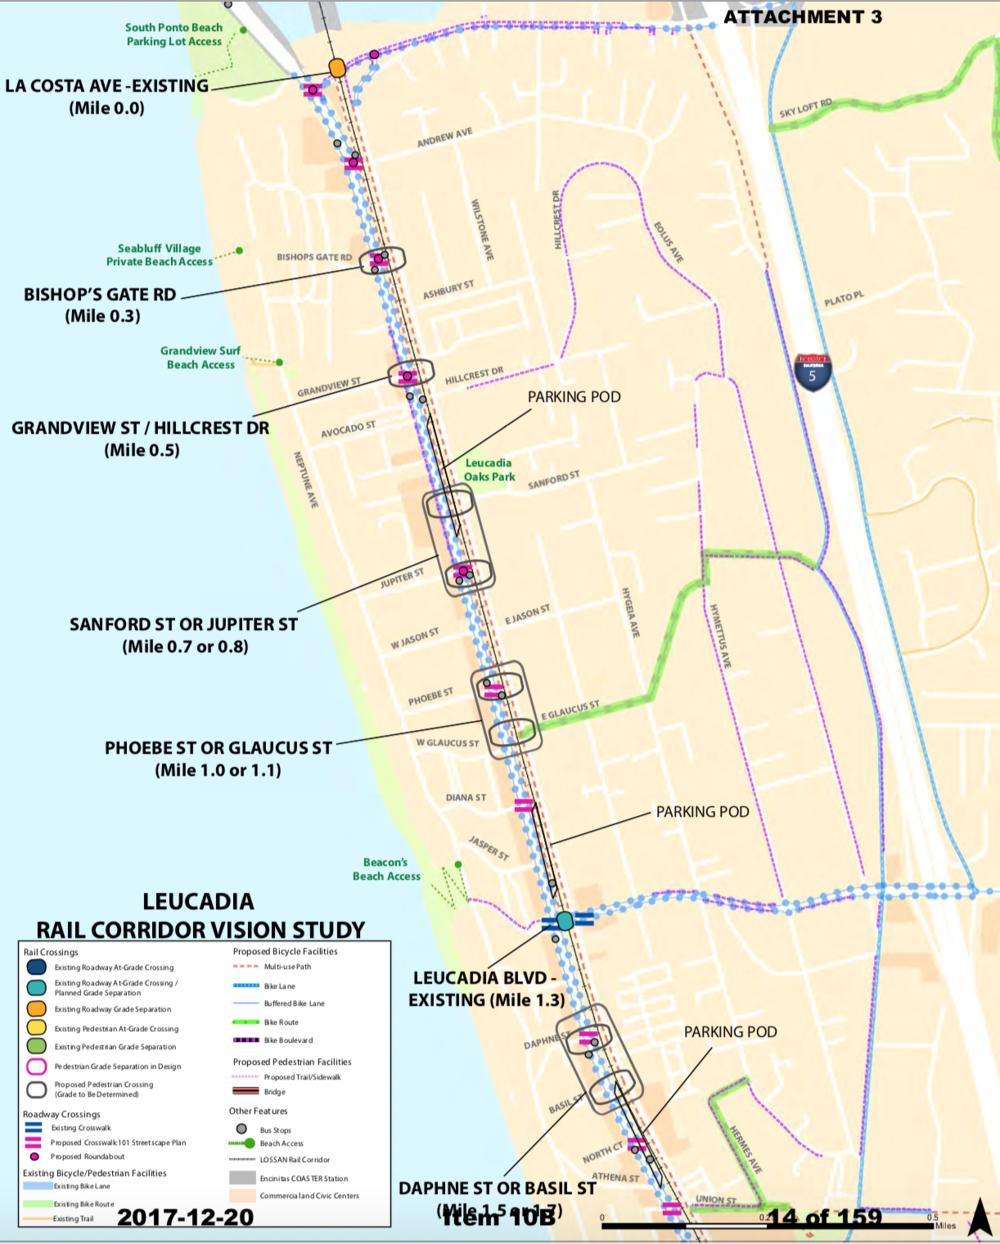 Rail Corridor Vision Study Update